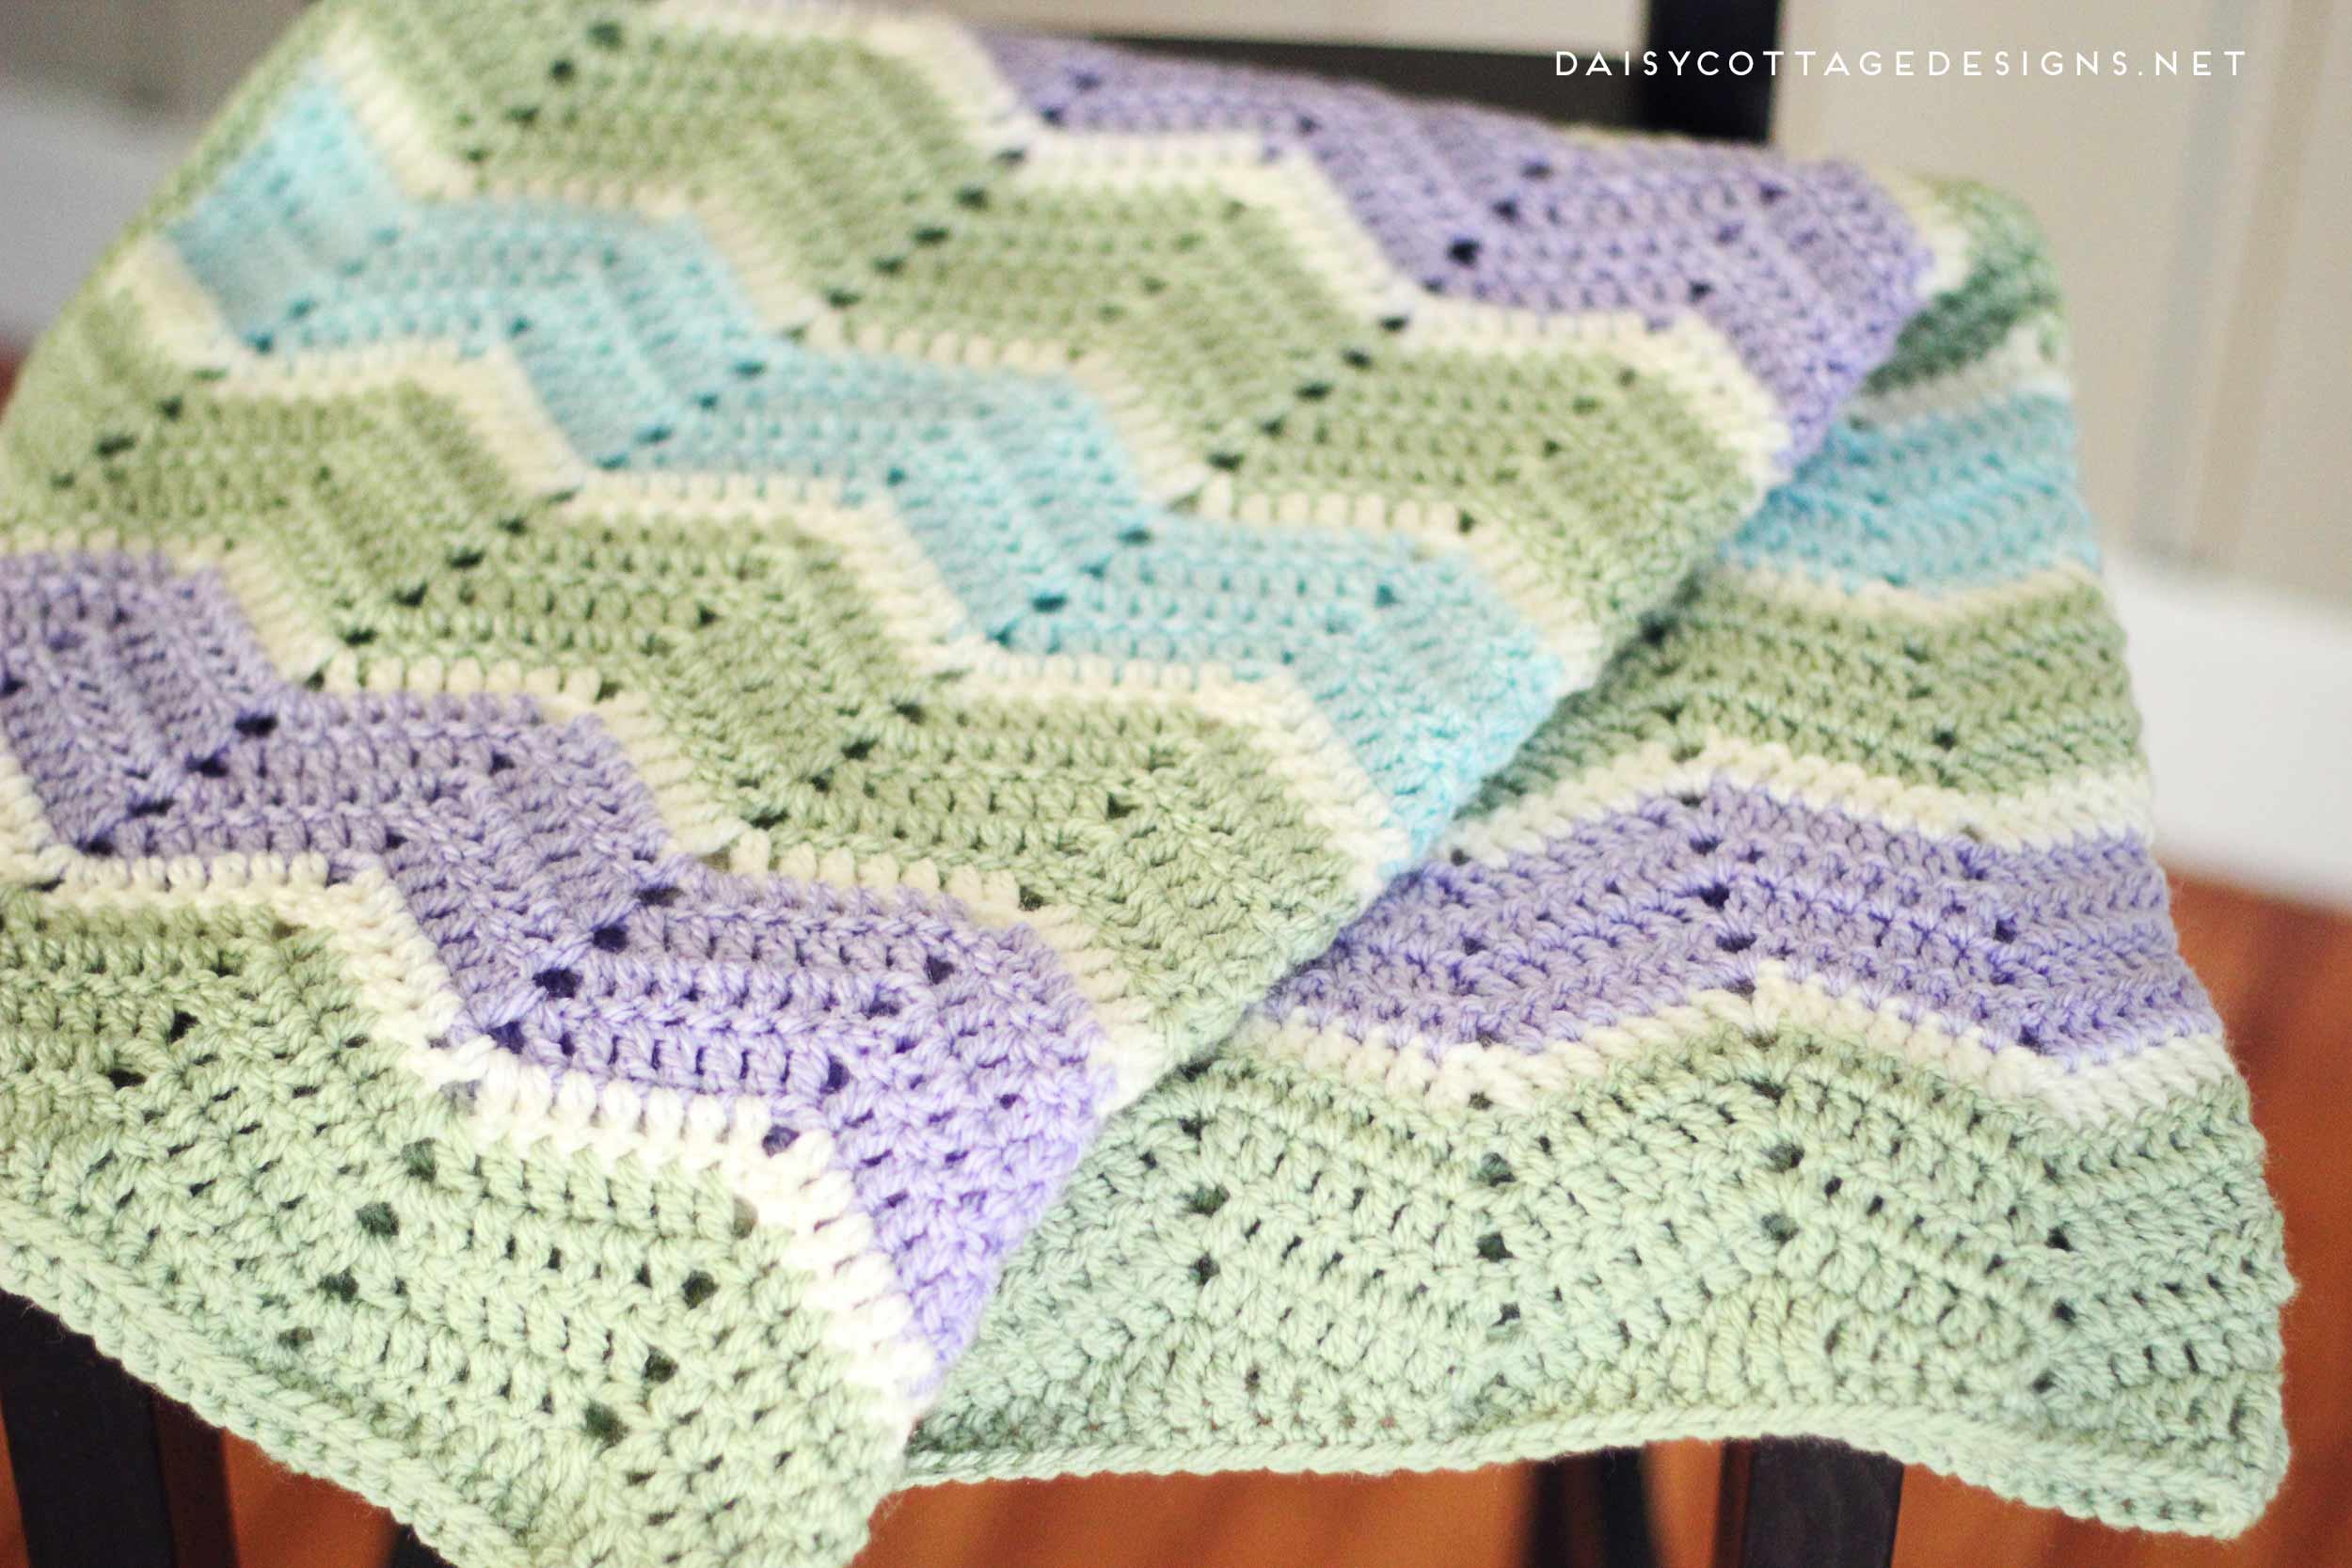 Blanket Crochet Pattern Free to Get You Warmer at Night Easy Chevron Blanket Crochet Pattern Daisy Cottage Designs